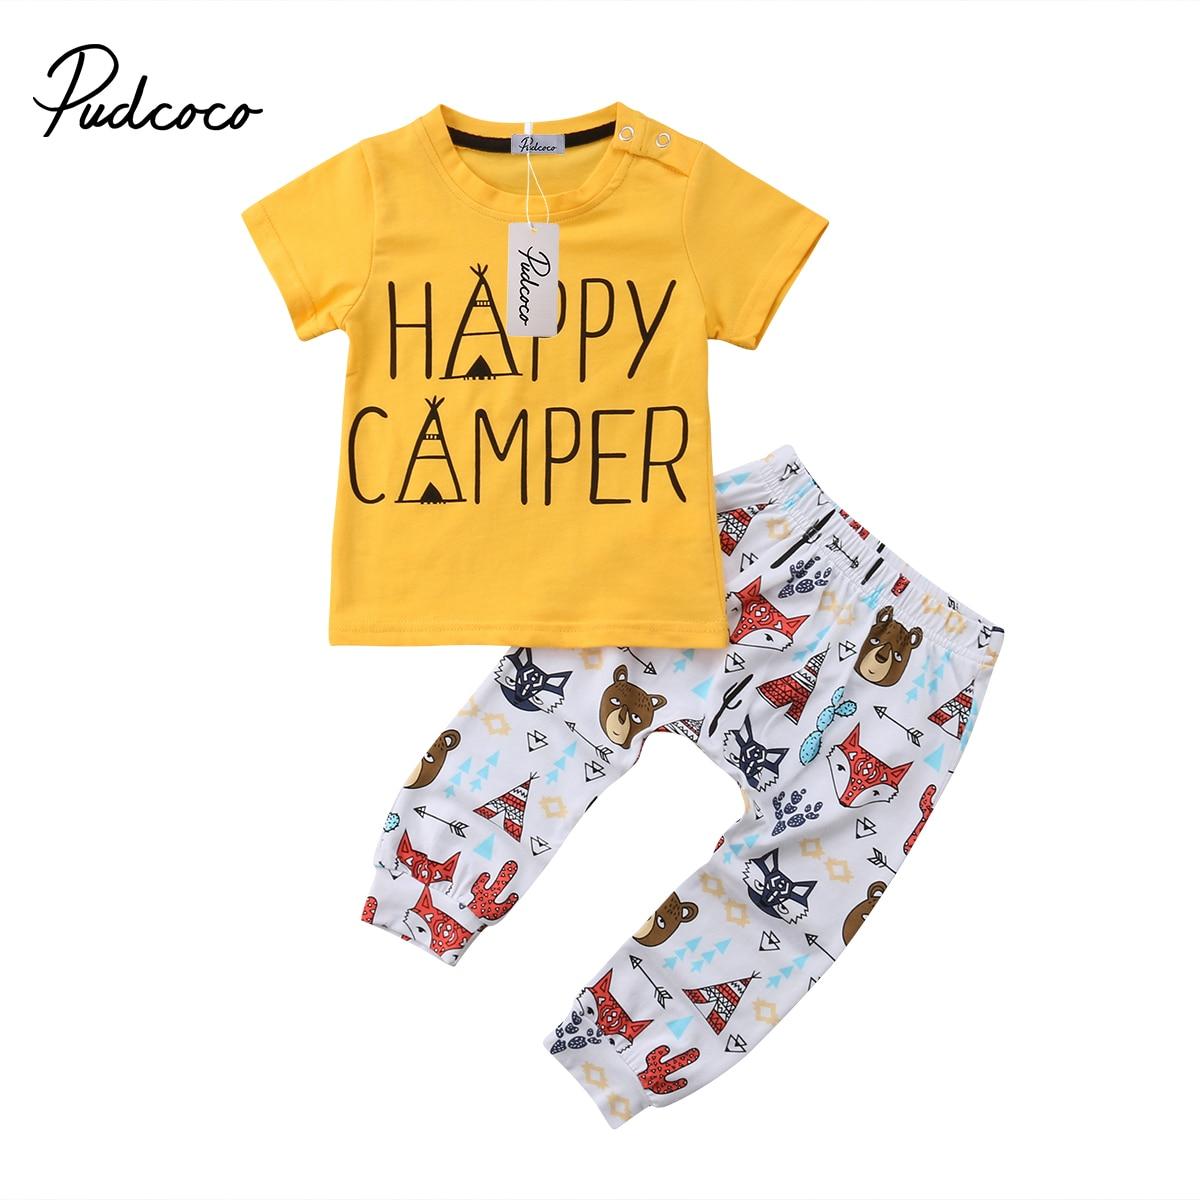 2018 Brand New Animali Appena Nati Infantili Neonati Maschi Ragazza Top T Shirt Pantaloni Outfit 2 Pz Set Happy Camper Estate Vestiti Ultima Moda